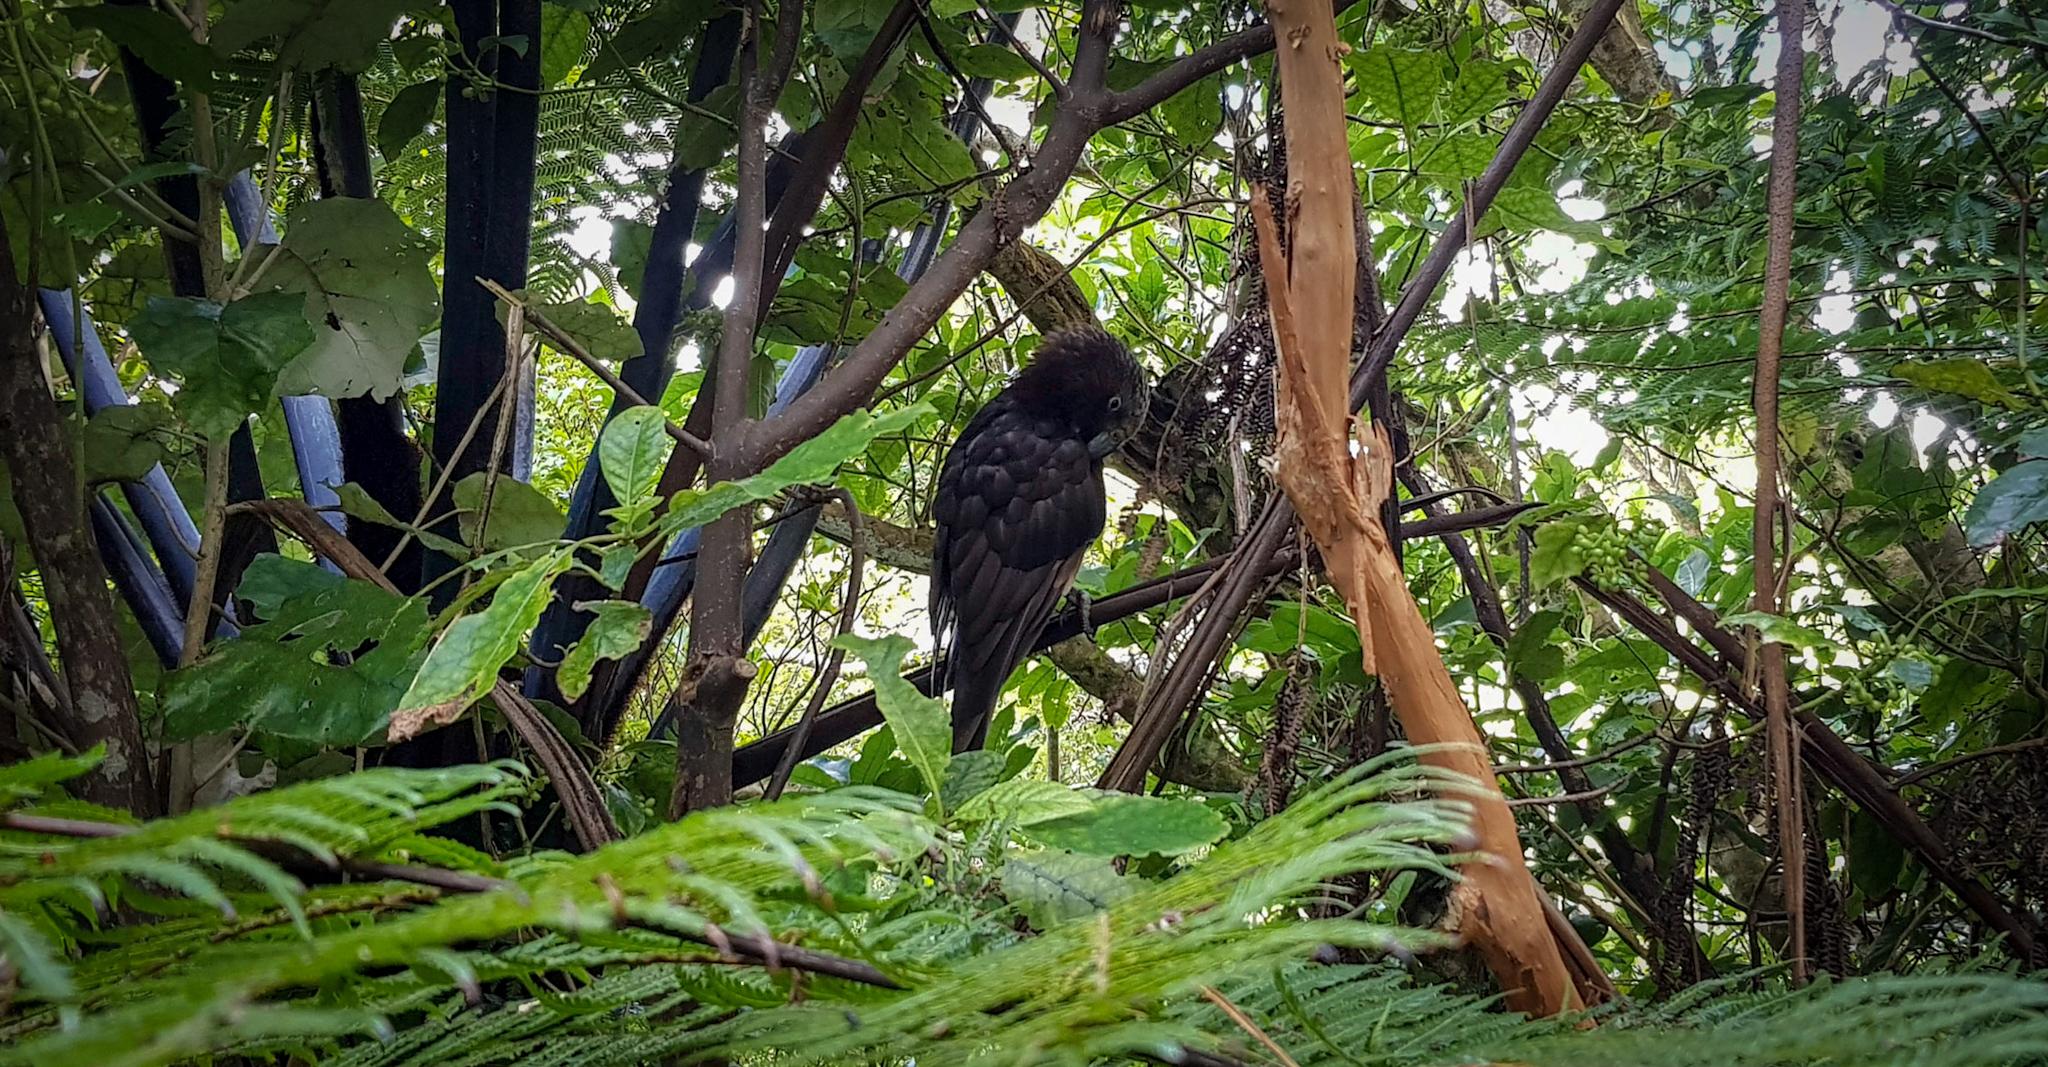 Vogel im Zealandia Naturschutzgebiet